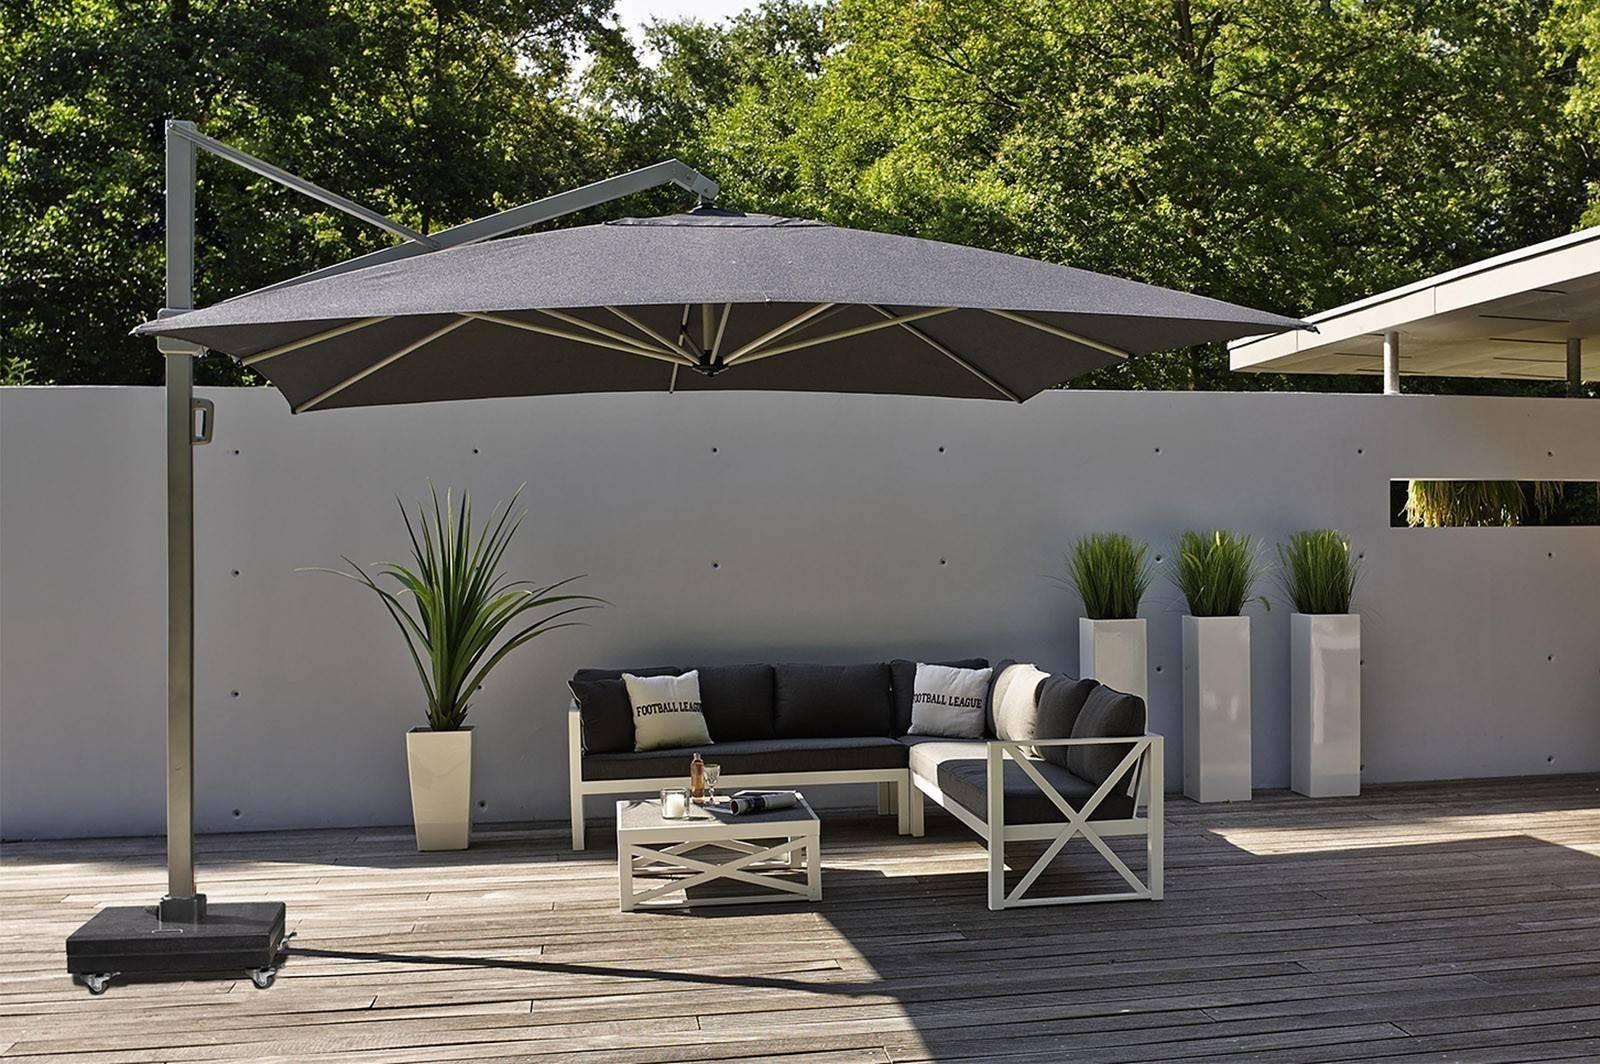 Záhradný slnečník ICON k bazénovému nábytku